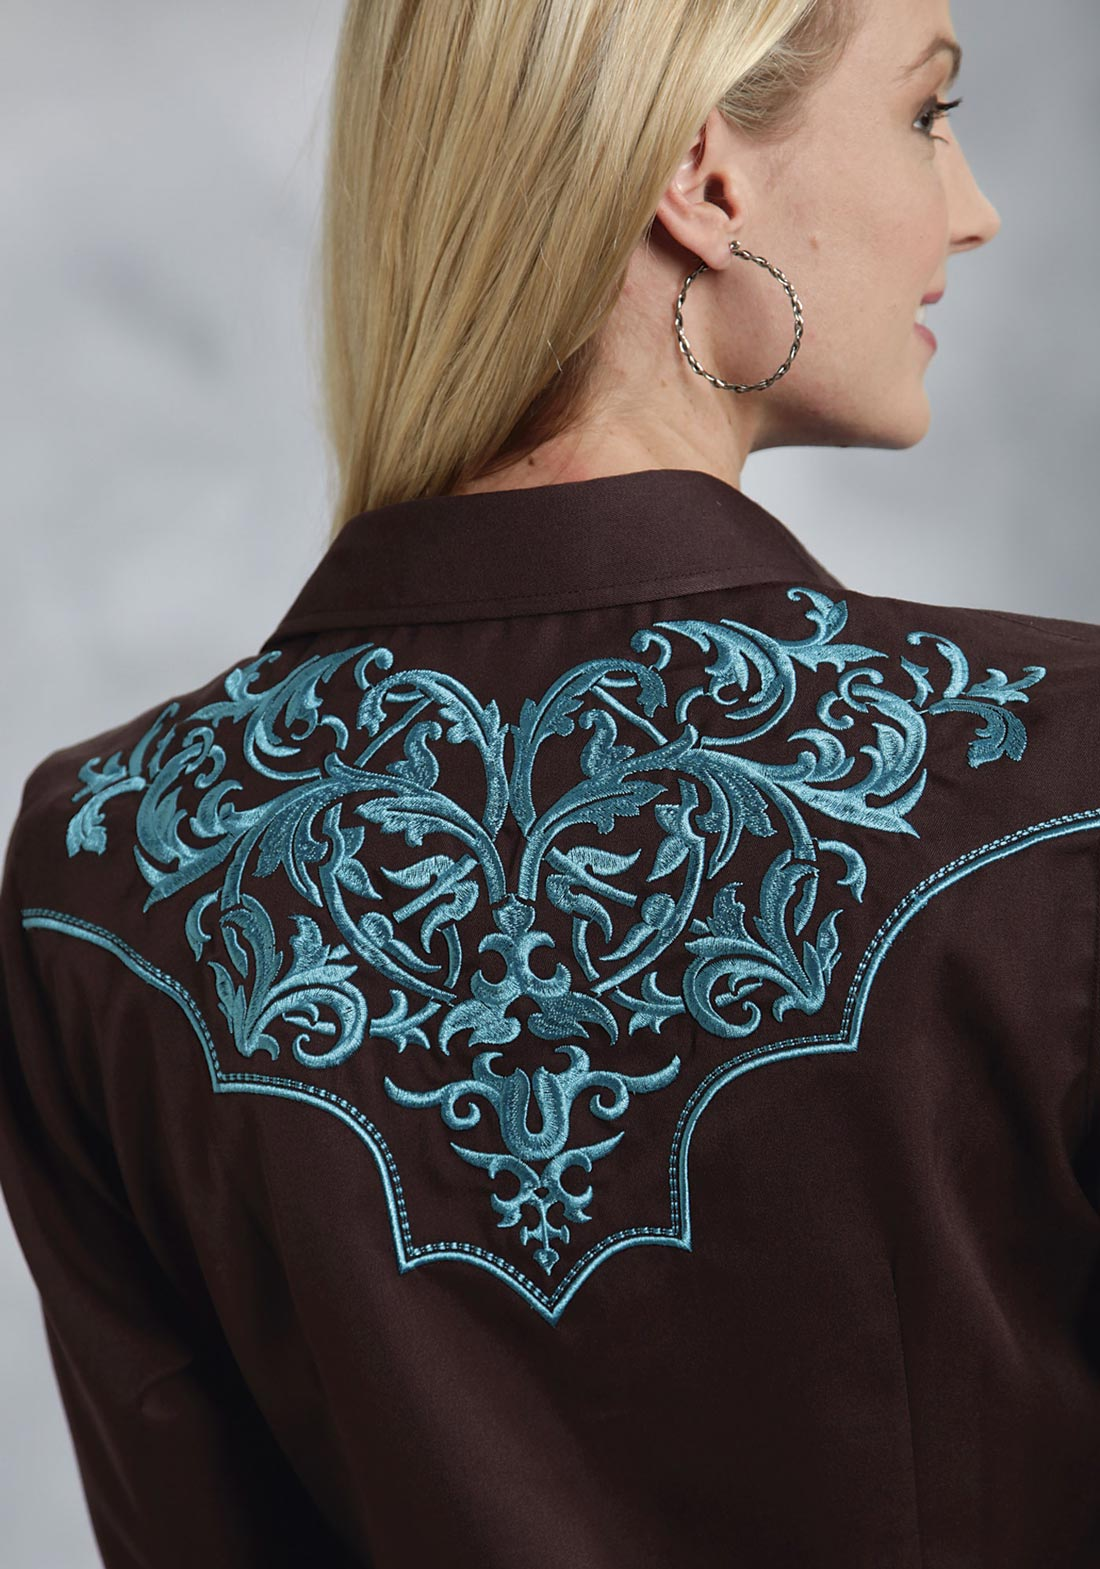 BB Dakota Cheryl Embroidered Denim Shirt at Nordstrom Rack - Womens Blouses  & Shirts - Womens